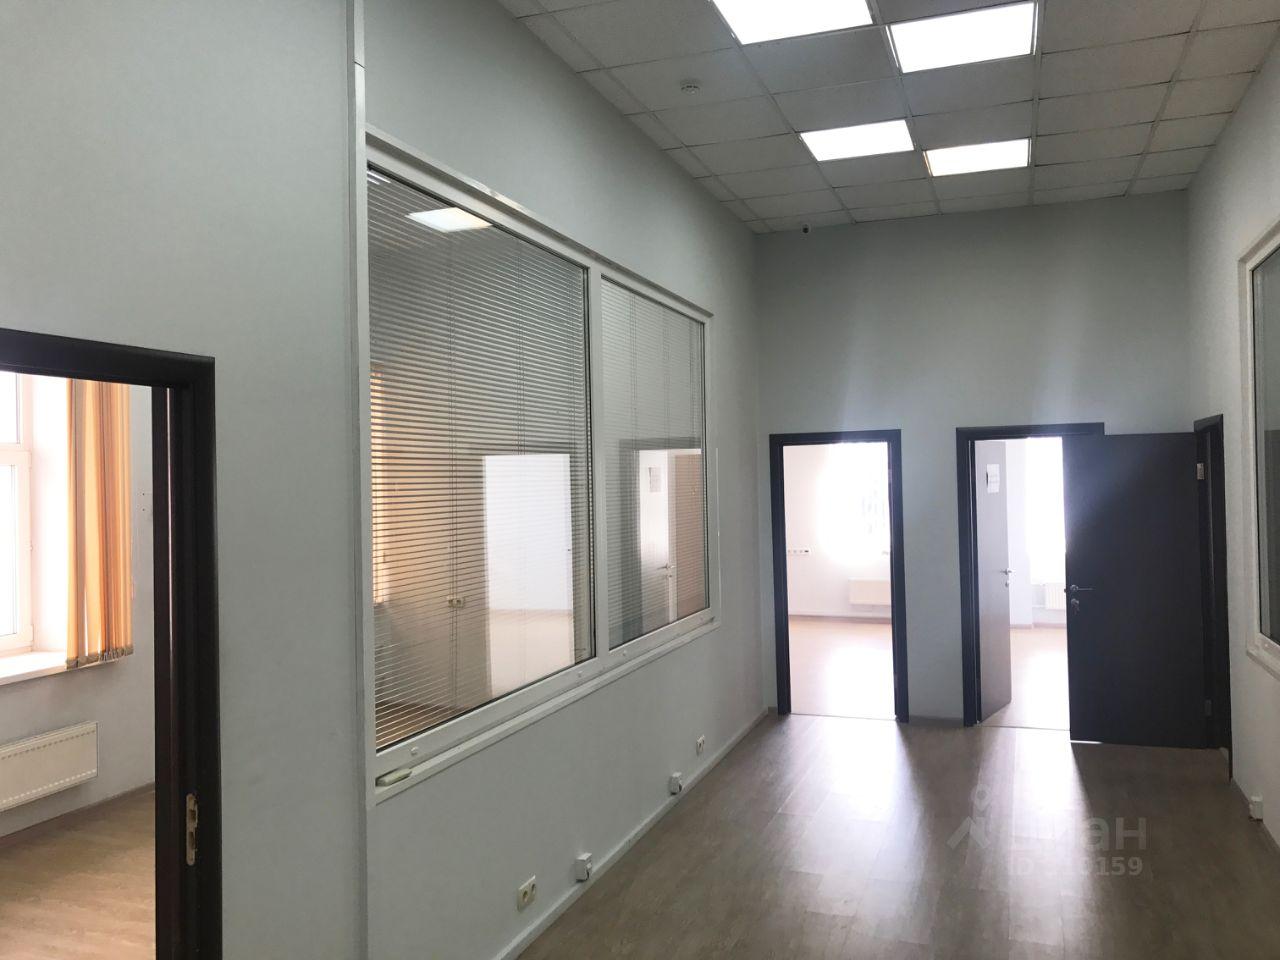 Аренда офисов москва м.третьяковская аренда квартир краснодар офисов